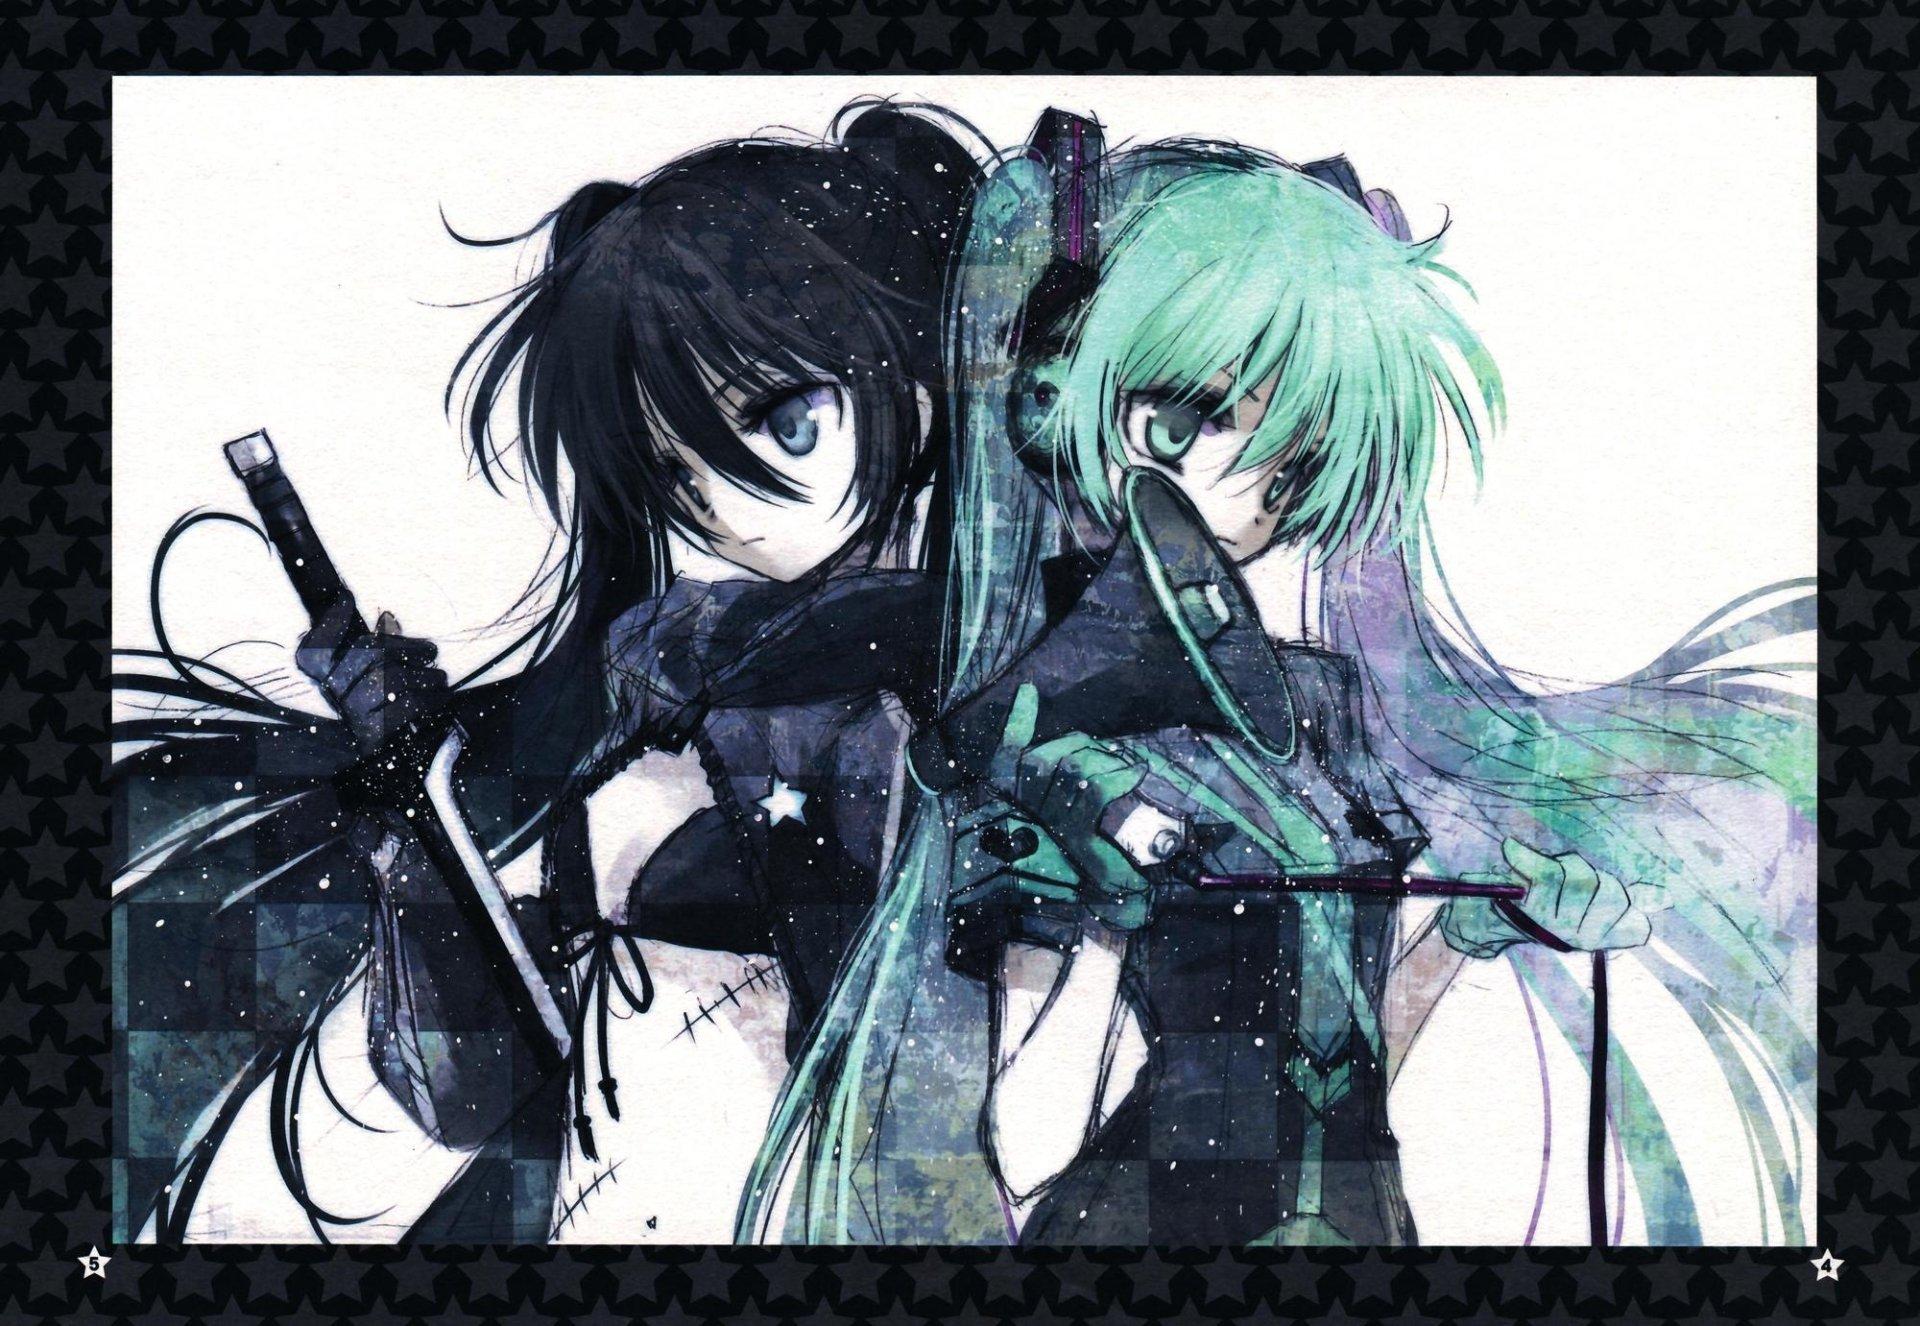 Anime - Crossover  Black Rock Shooter Hatsune Miku Wallpaper